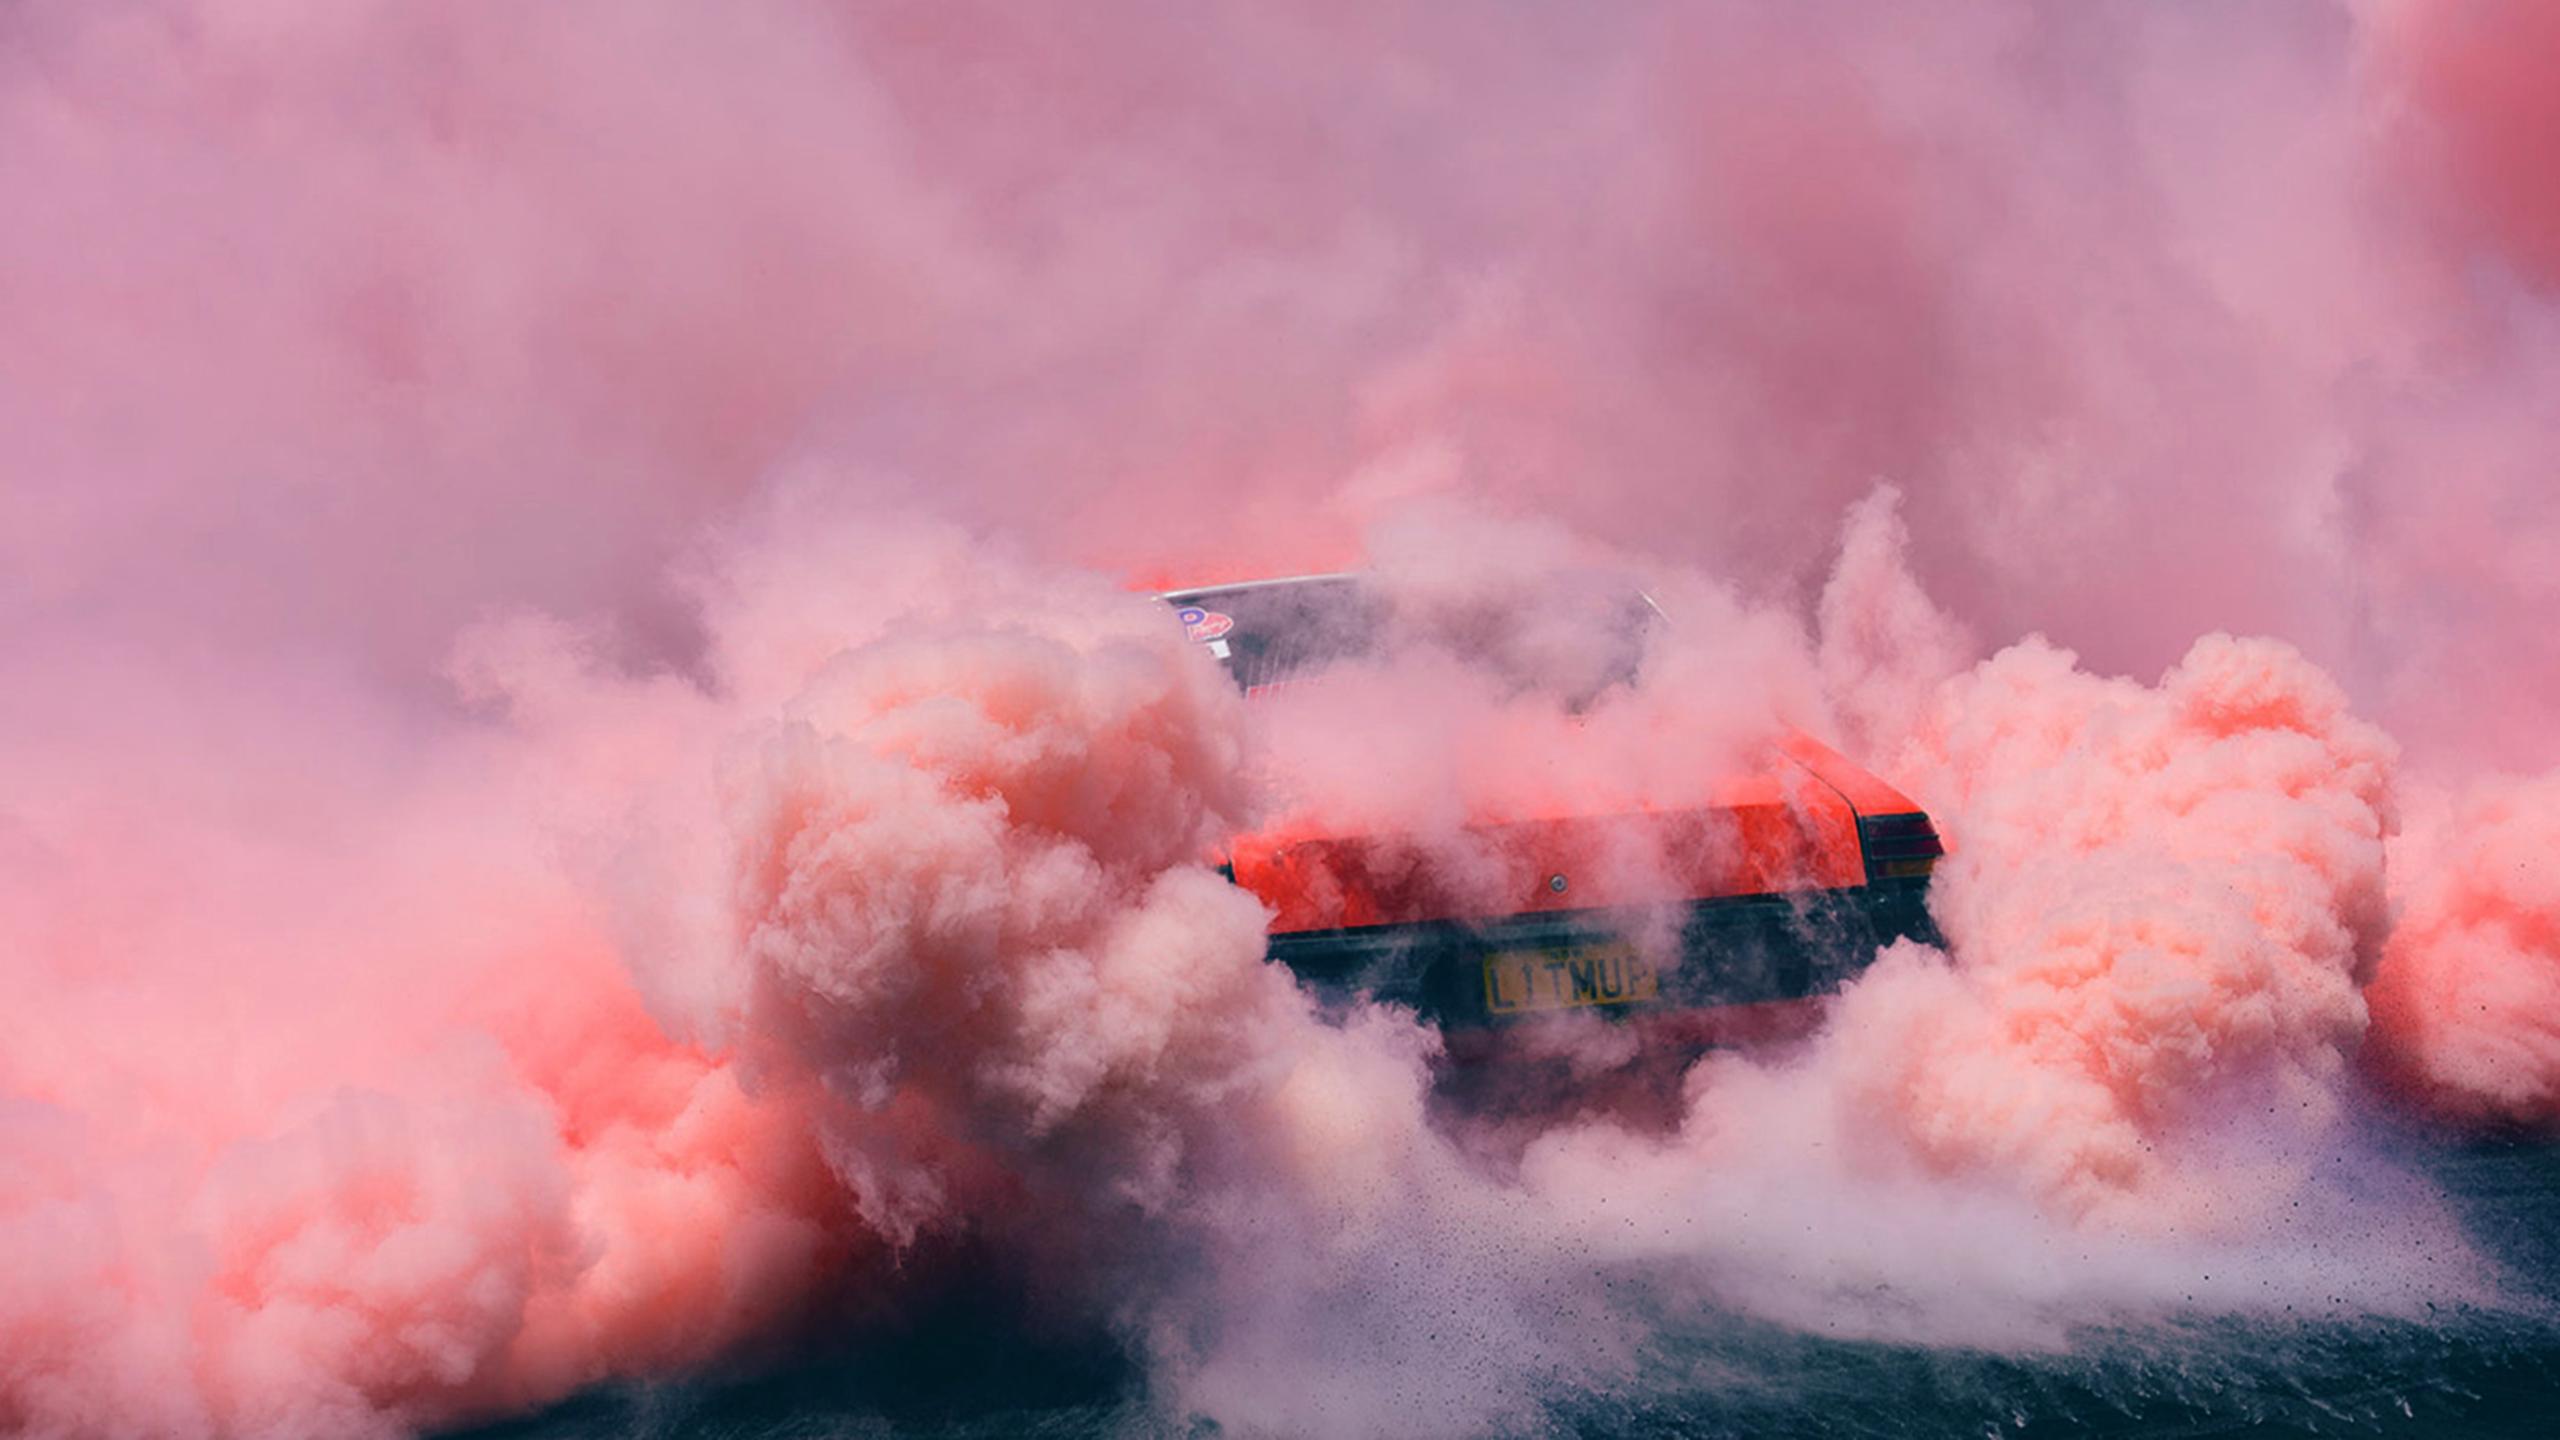 Wallpaper Colored Smoke Red Cars Pink 2560x1440 Bossujohnson